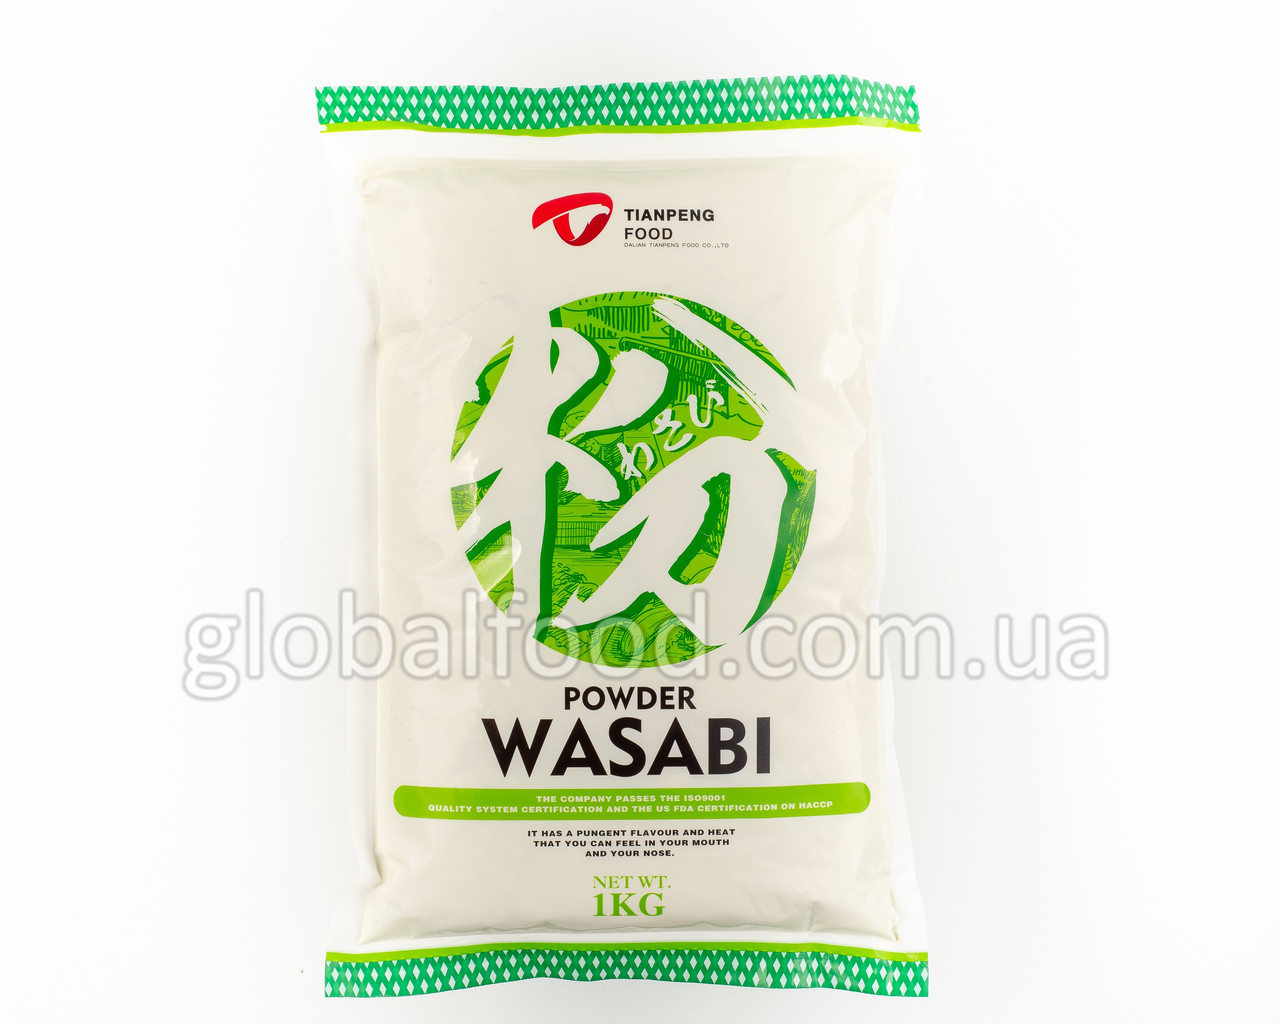 Васаби Сухой Порошок Yamato (острый) (1 кг.)